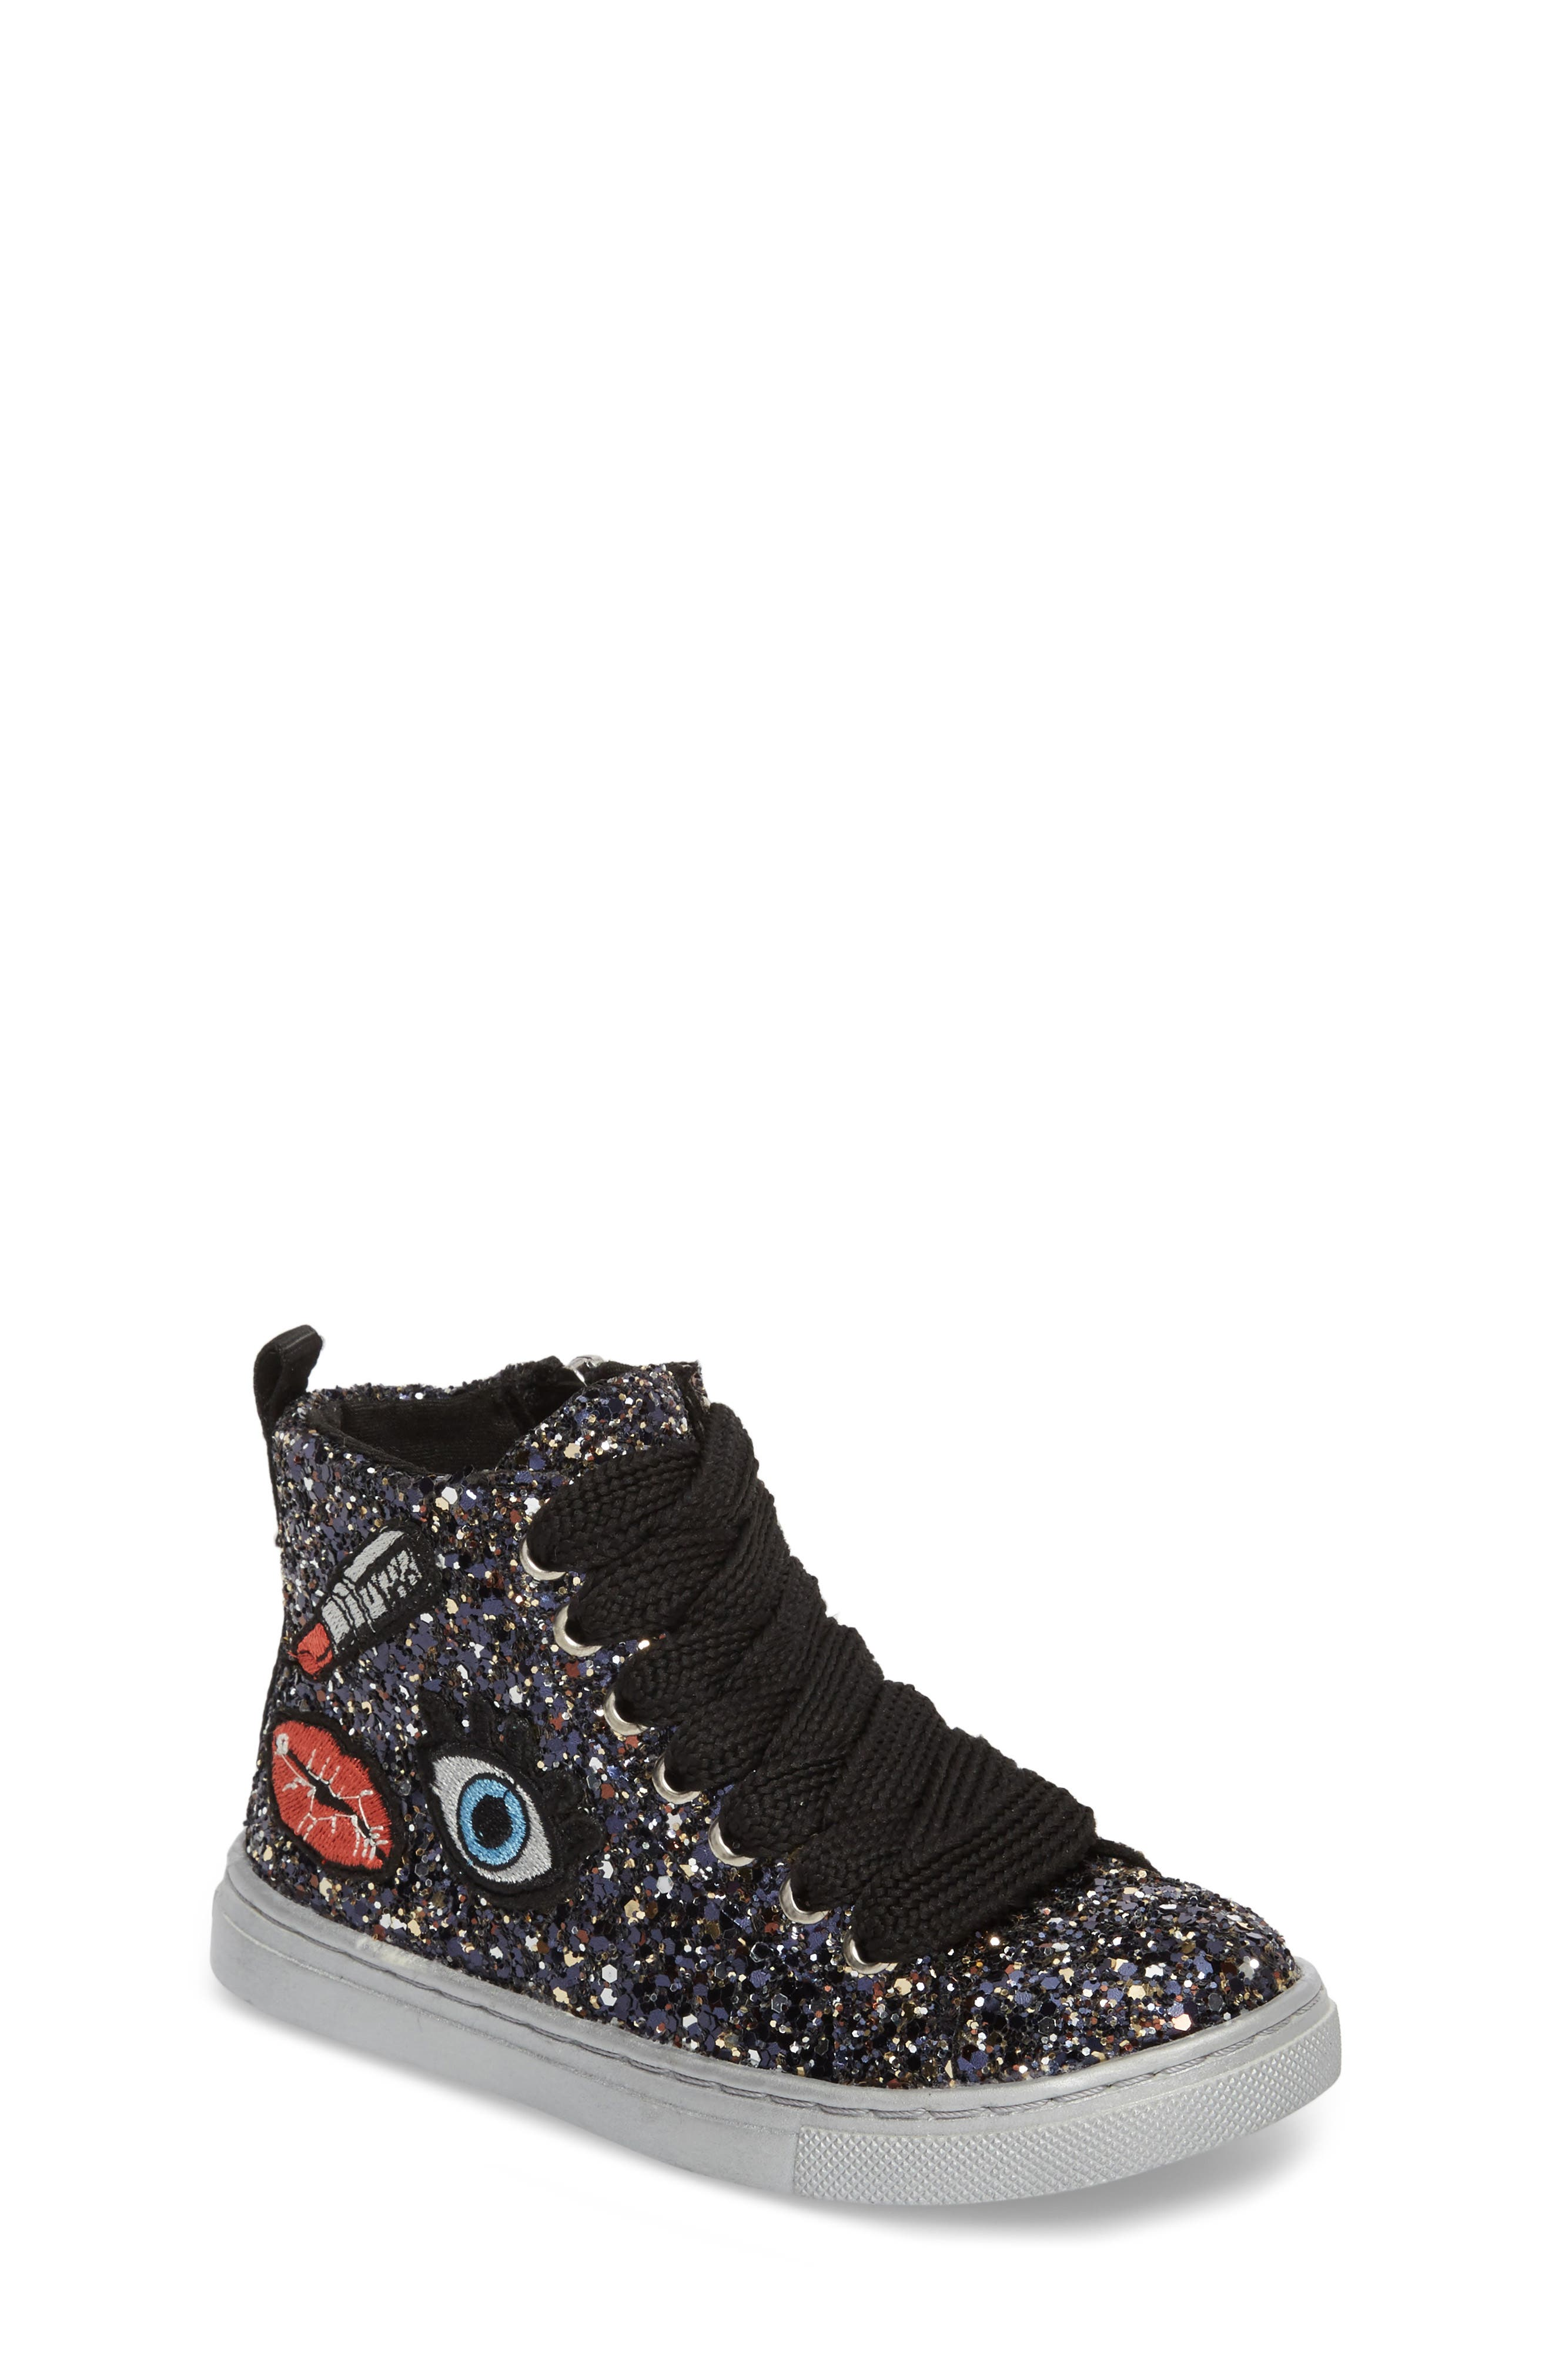 Zaine Glittery High Top Sneaker,                             Main thumbnail 1, color,                             001